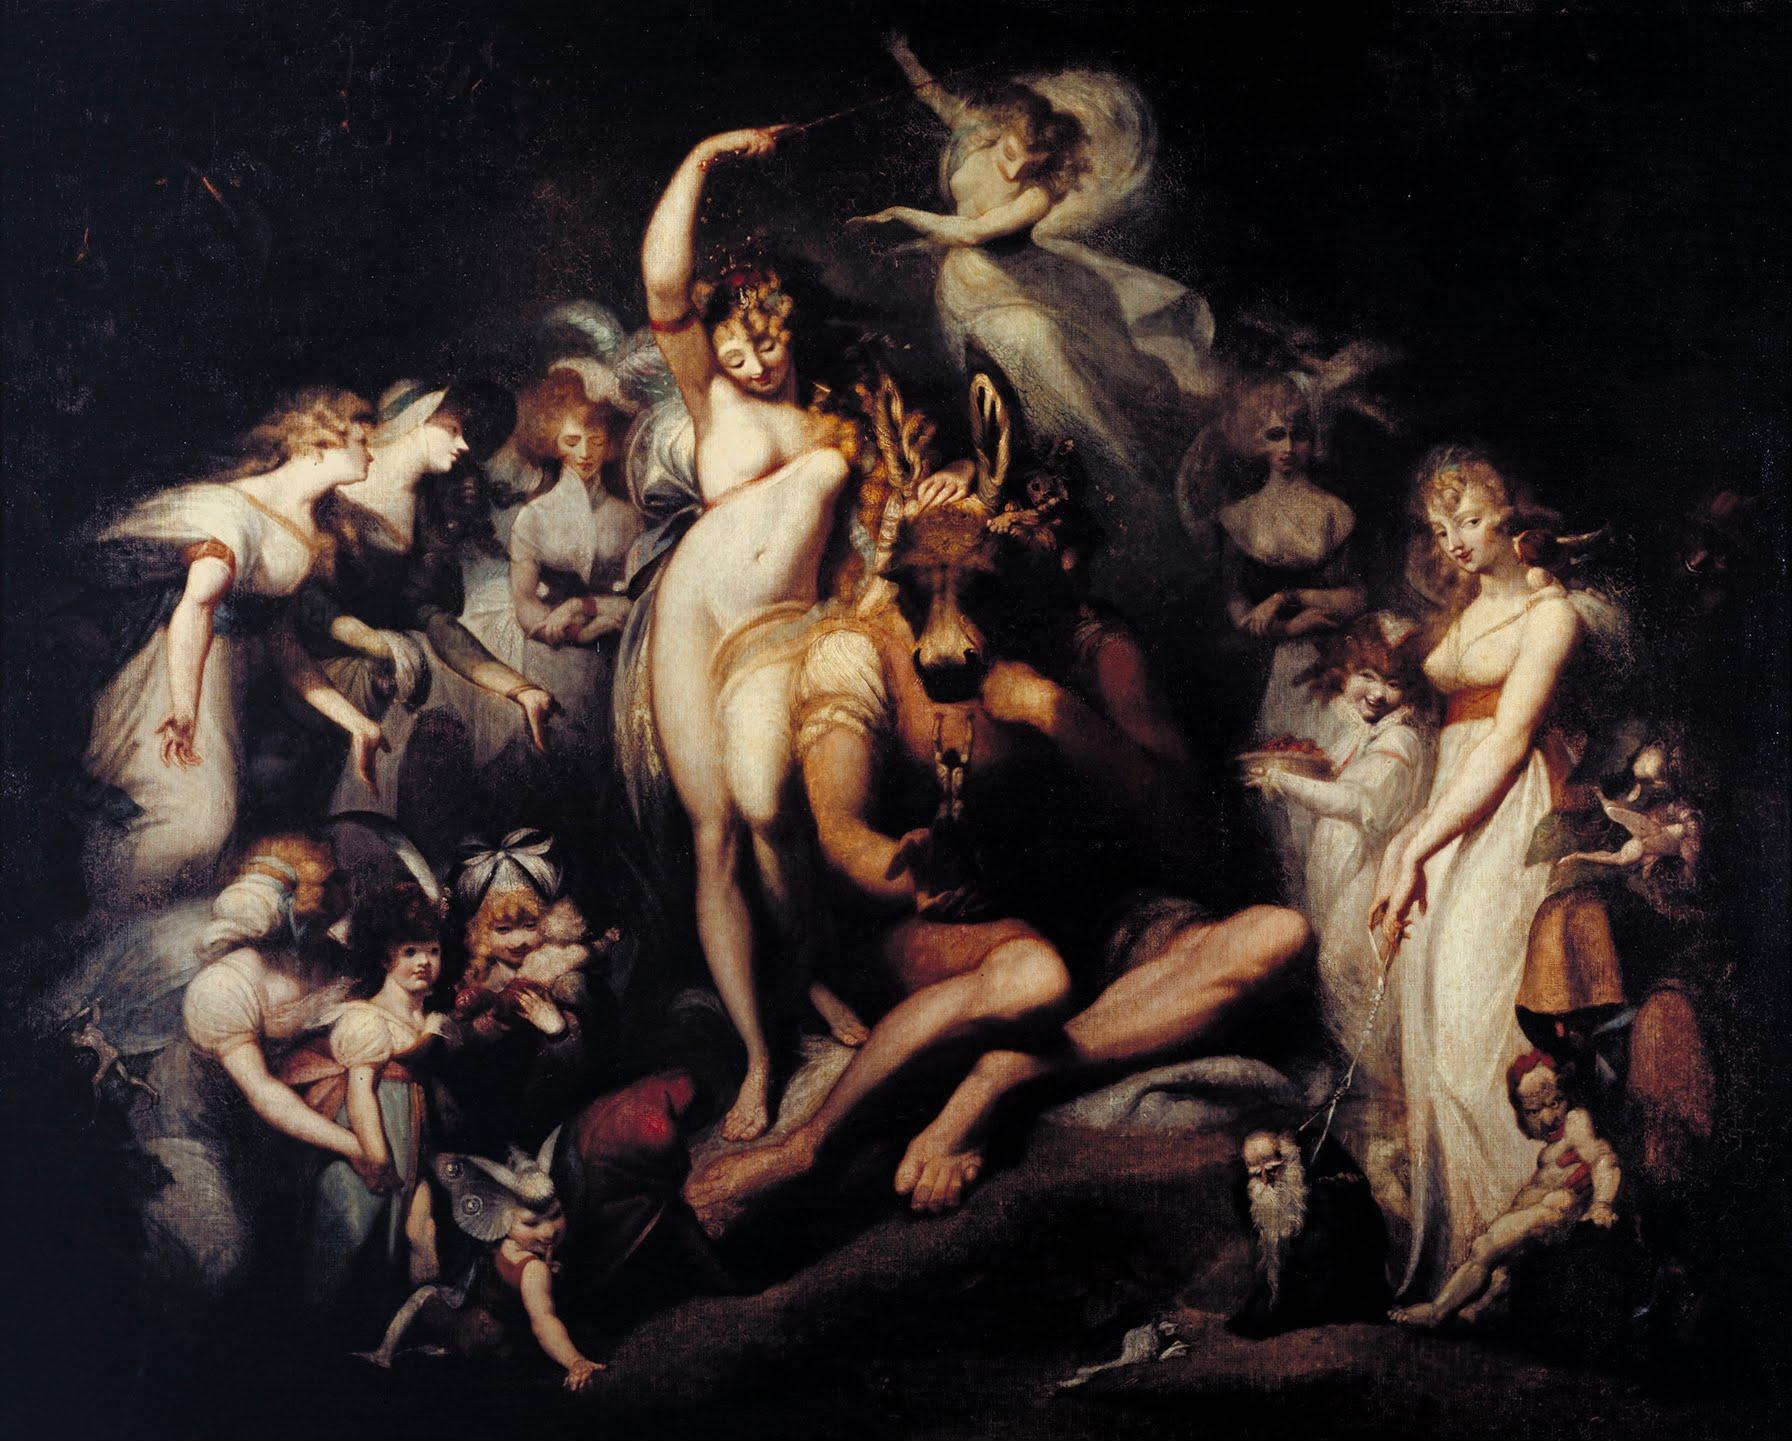 Henry Fuseli,  Titania and Bottom , c. 1790, Tate Britain.